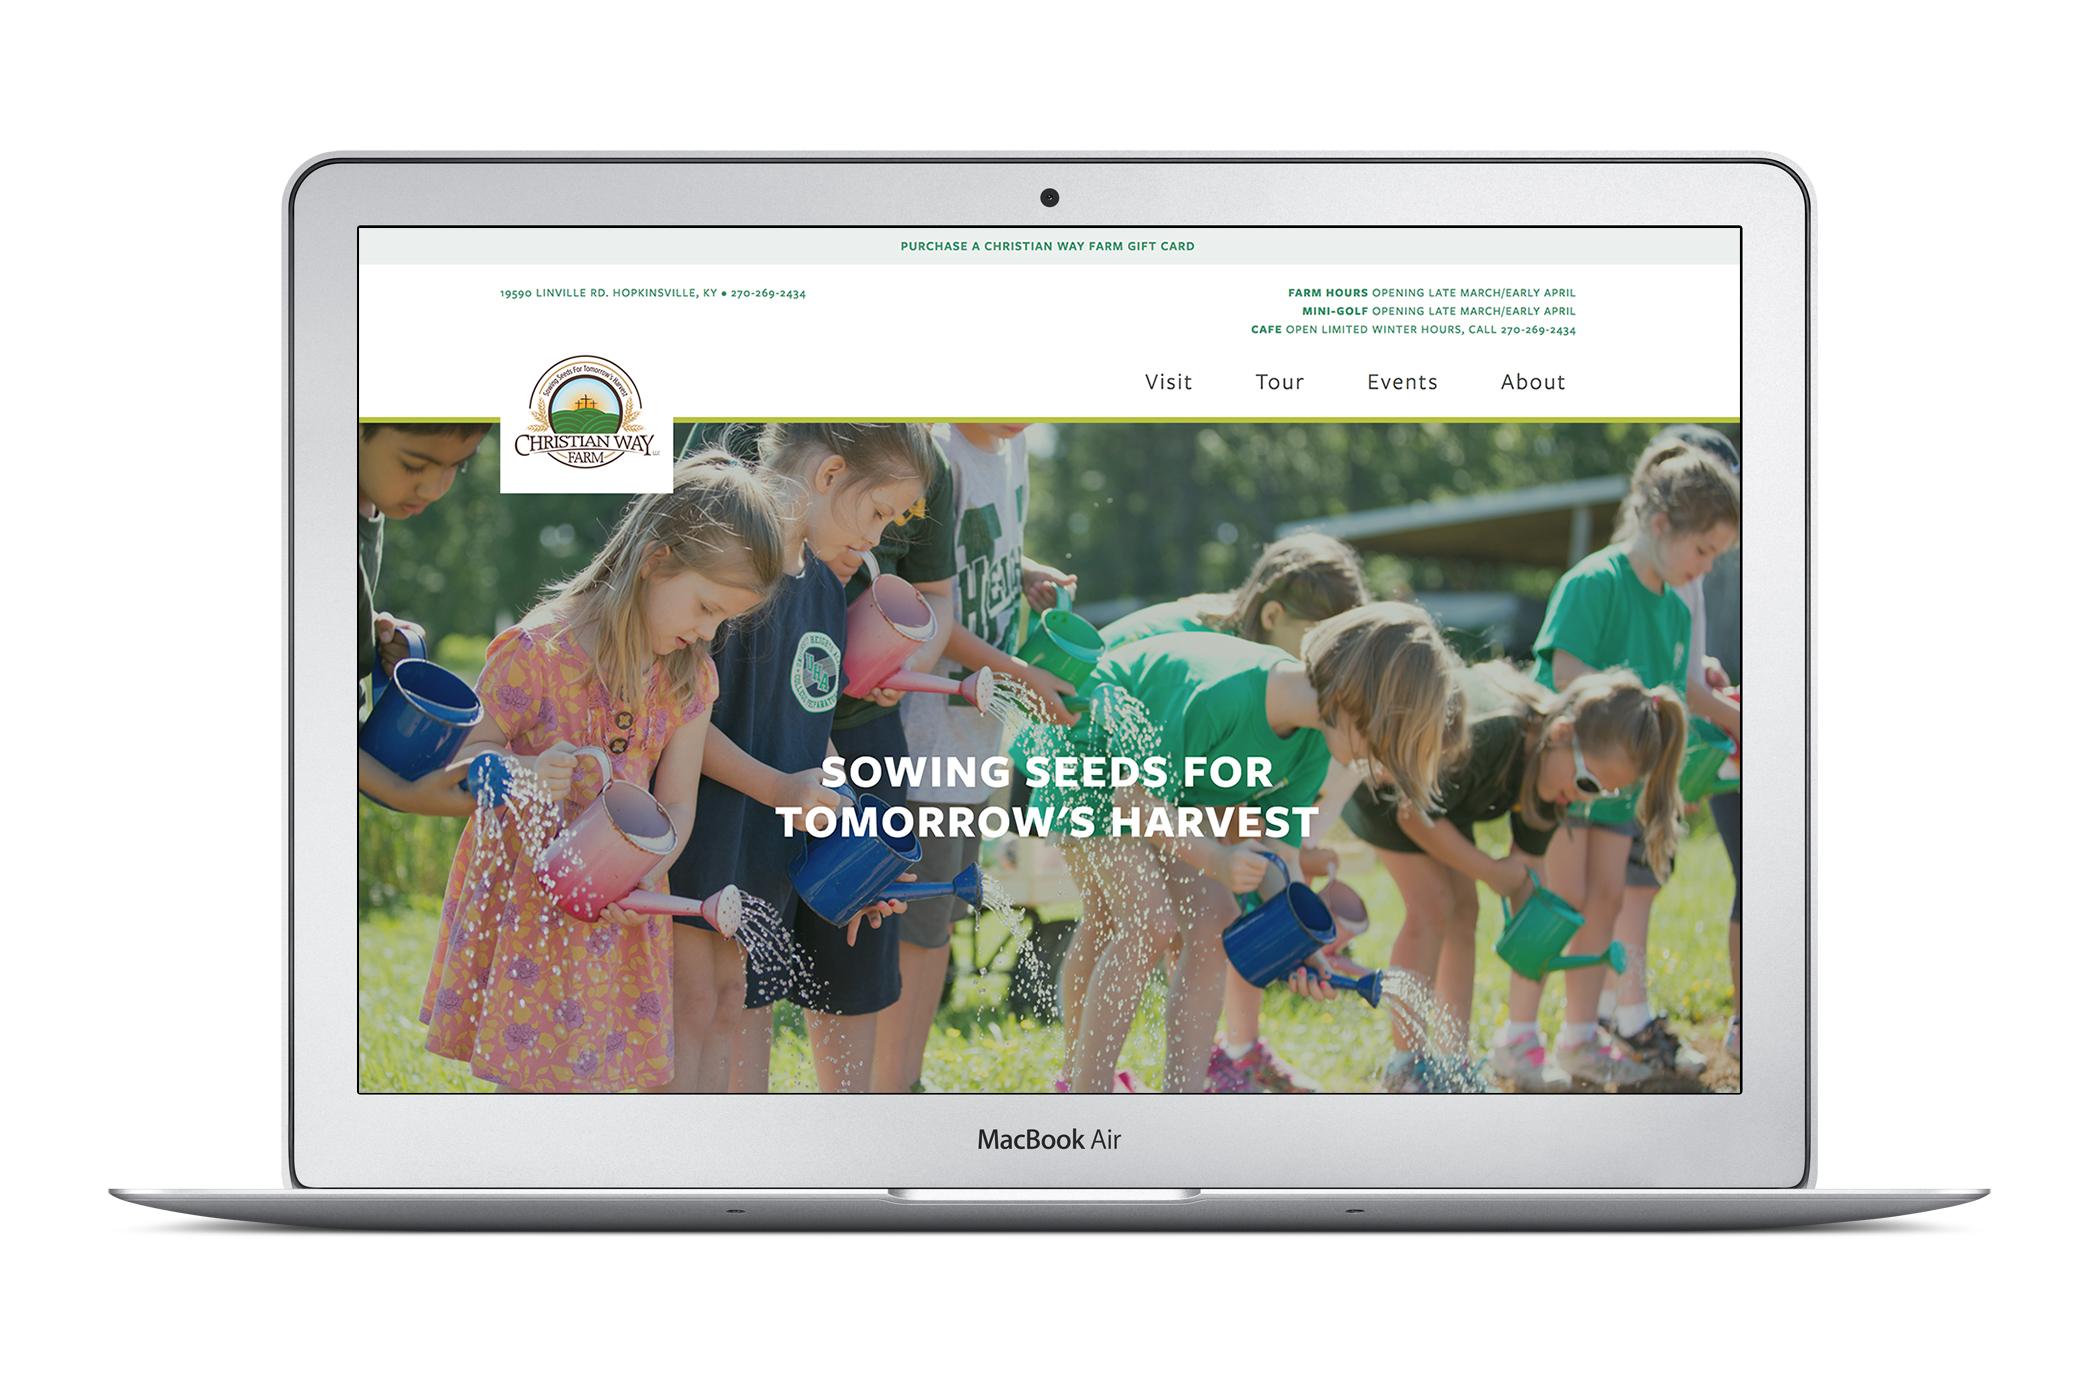 Christian Way Farm Website Design